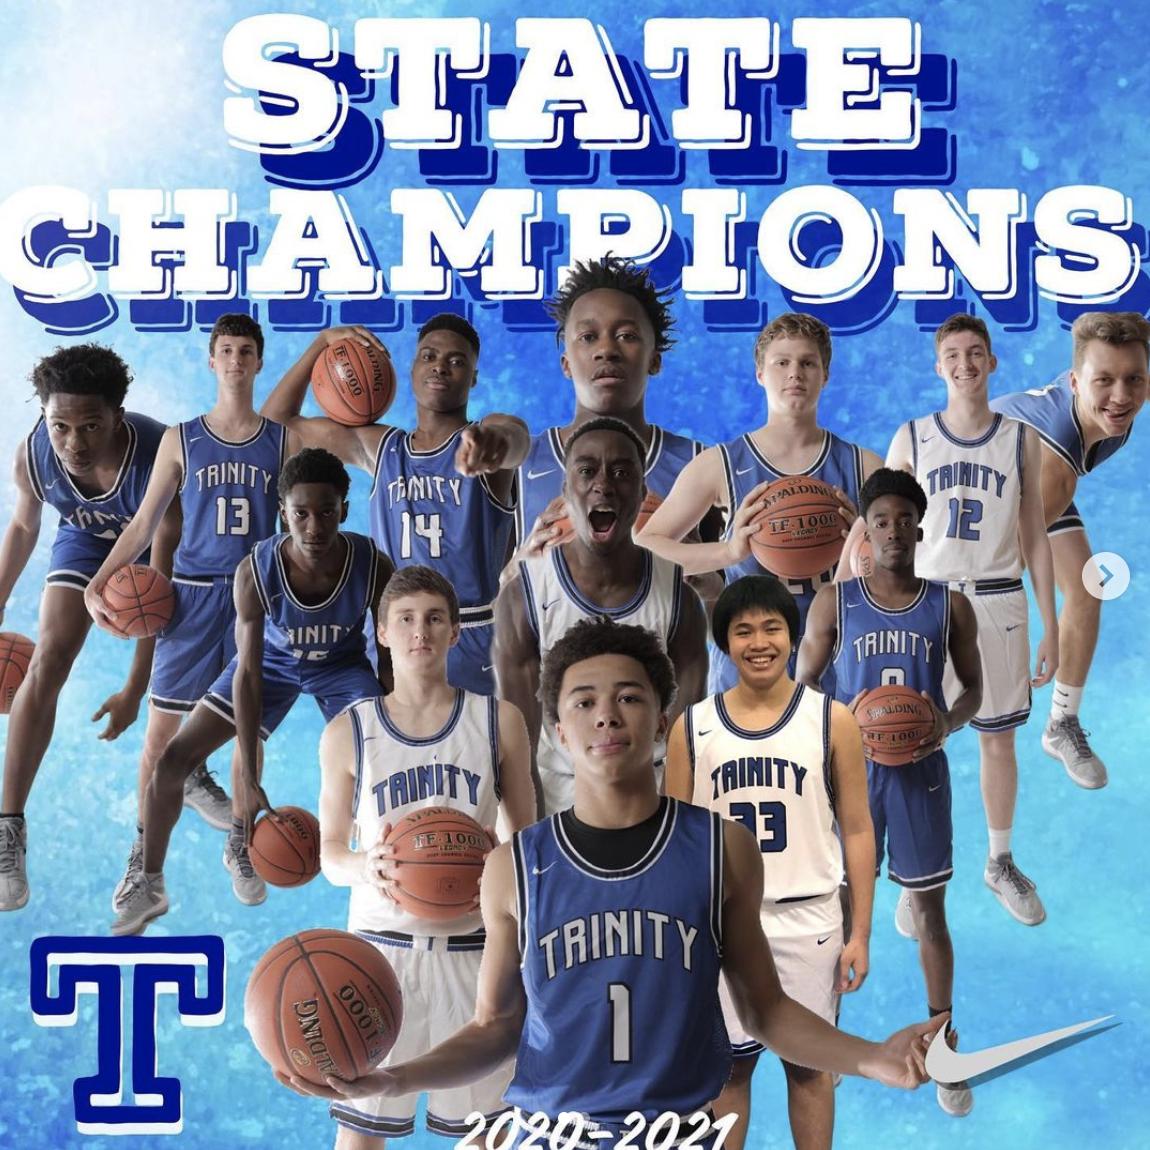 Varsity Boys Basketball 3A State Champions